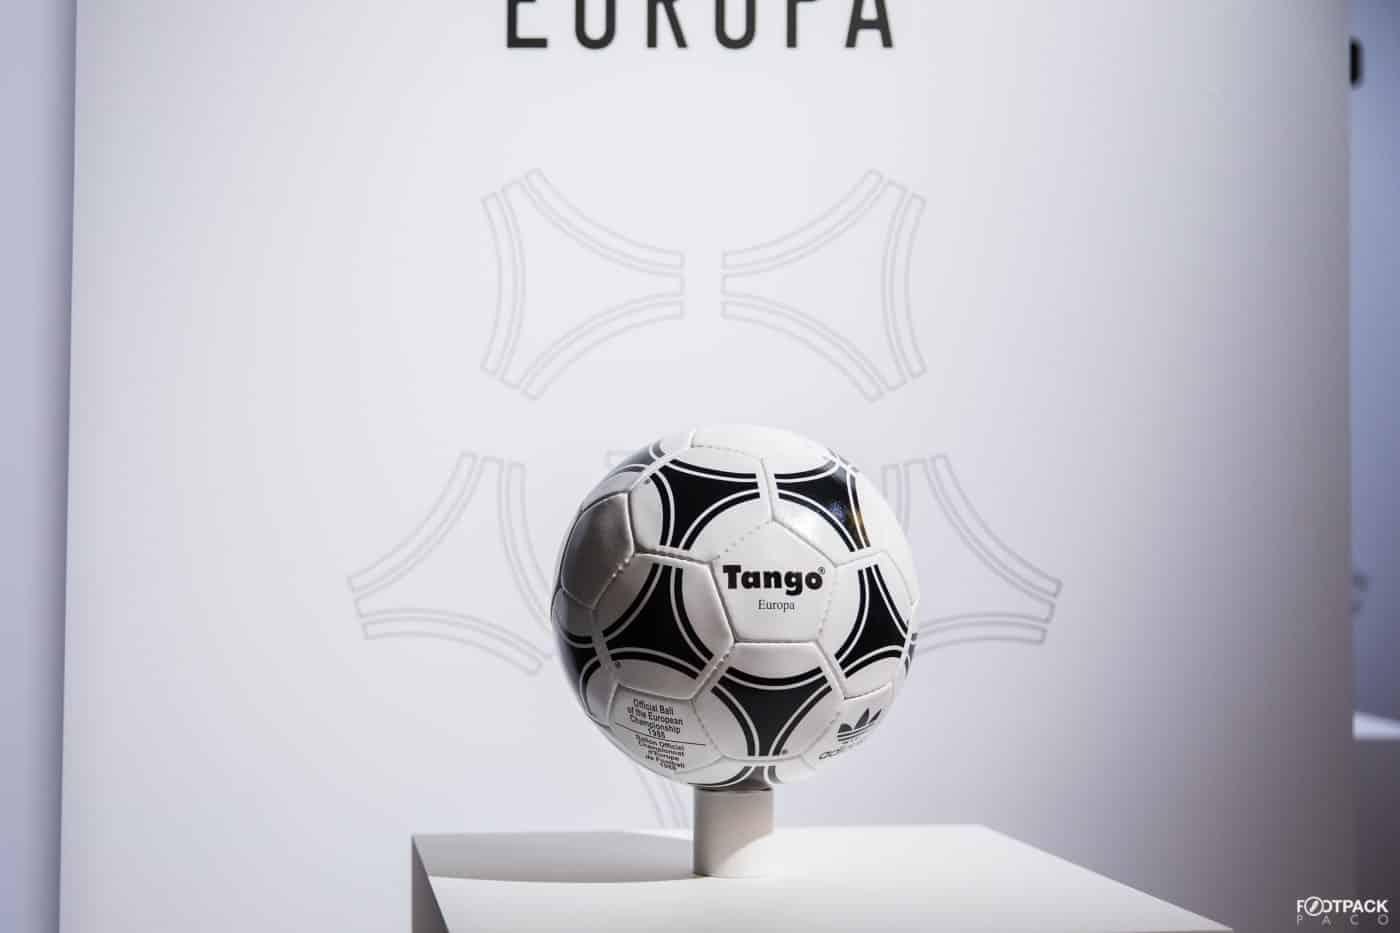 ballon-football-adidas-euro-1988-footpack-2019-2